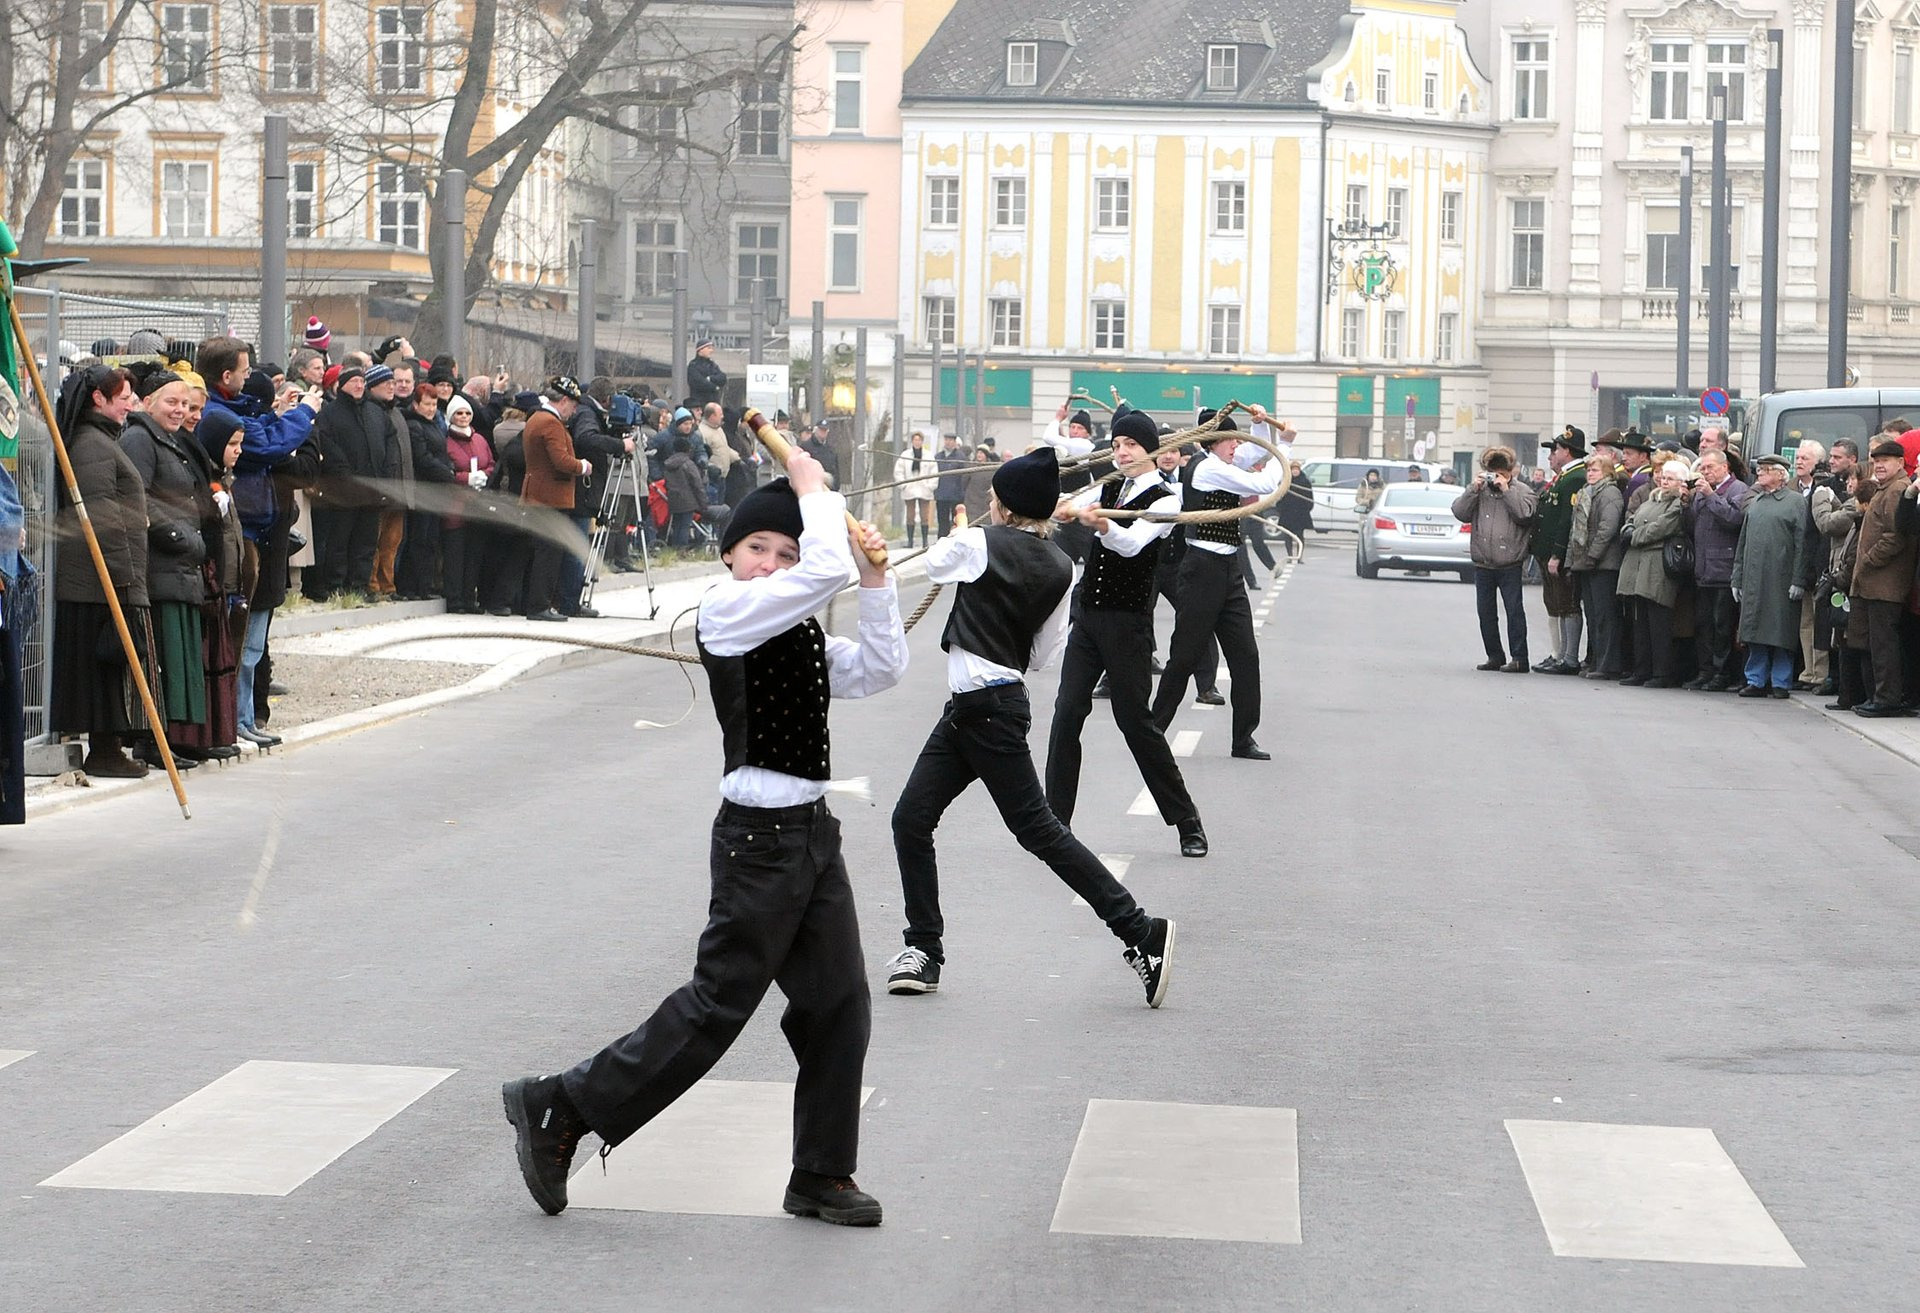 Aperschnalzen in Austria - Best Season 2020